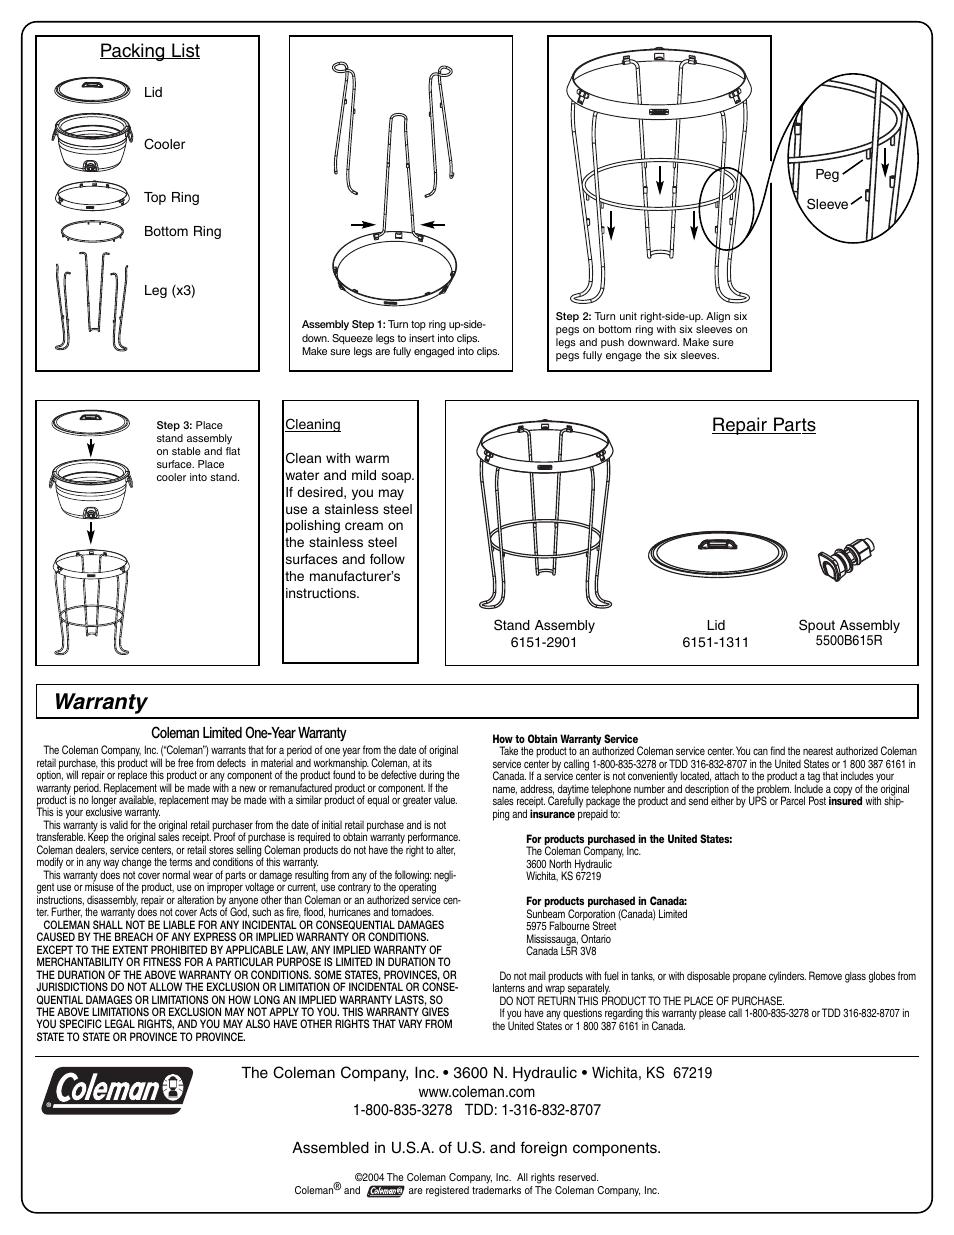 Warranty  Packing List  Repair Parts